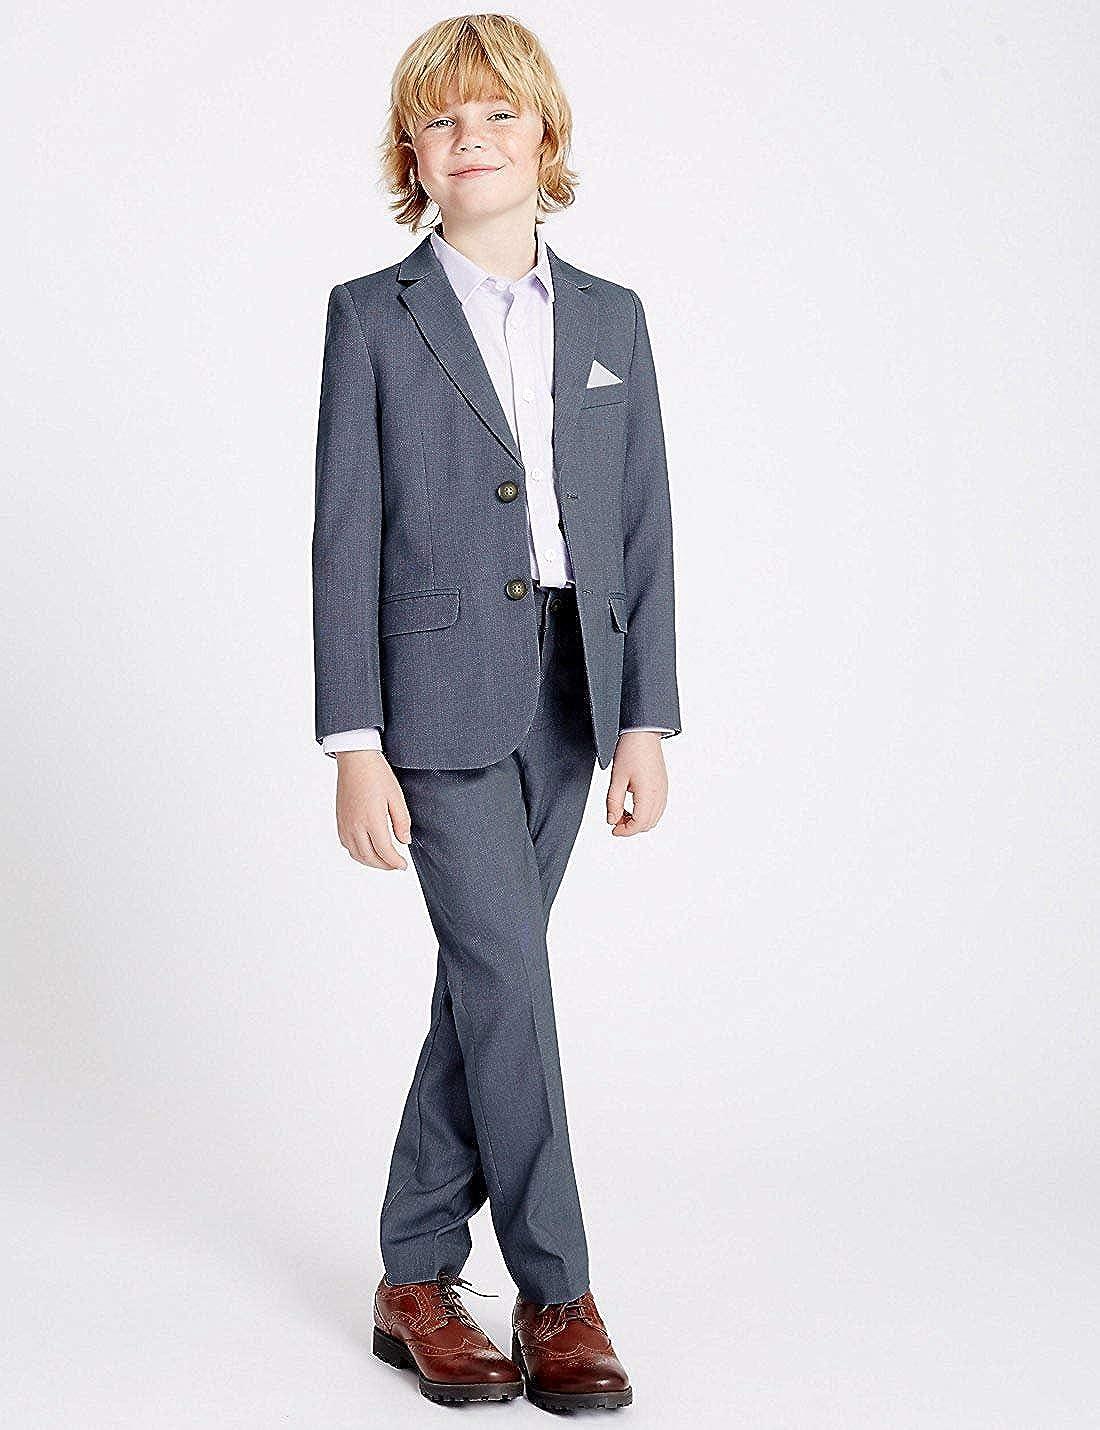 Amazon.com: Grey Formal Wedding Boys Suit Children Tuxedo ...